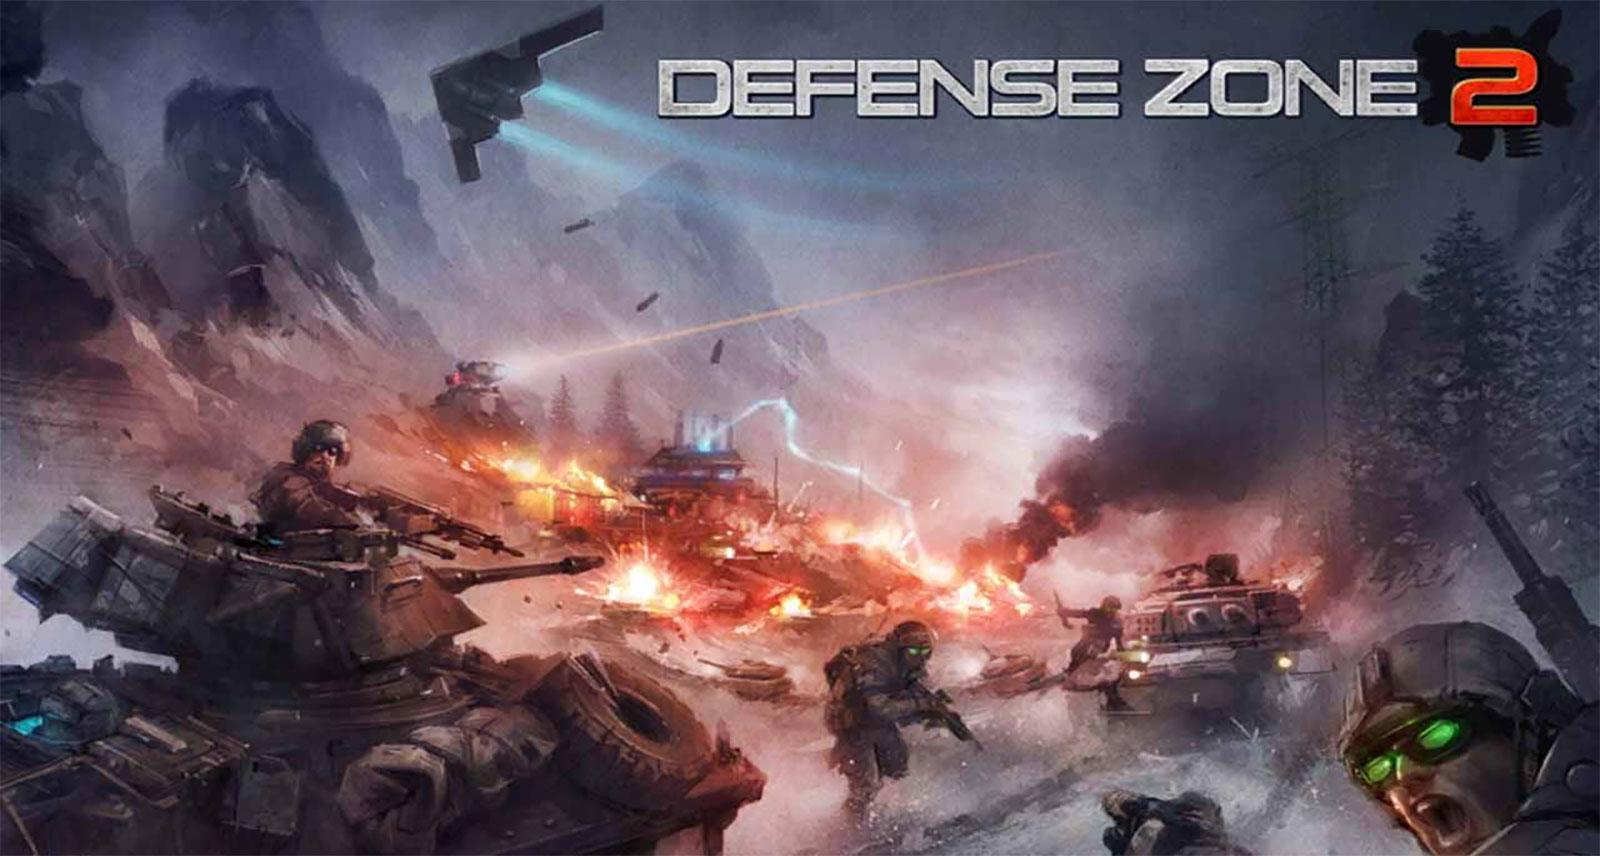 Defense Zone 2 HD Mod Apk